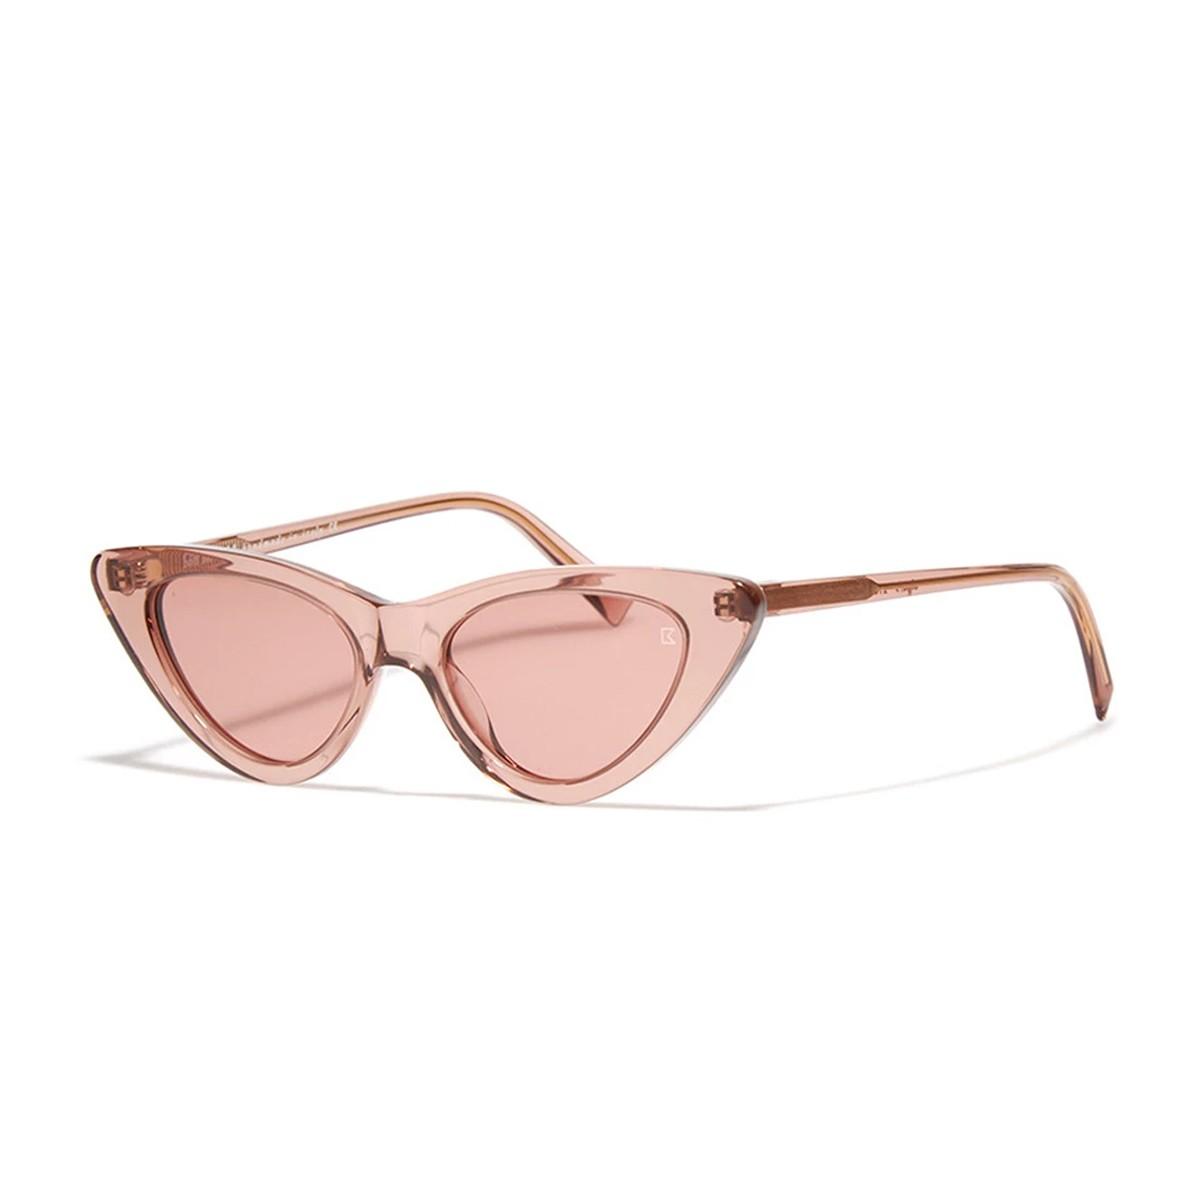 Bob Sdrunk Olga/S | Women's sunglasses